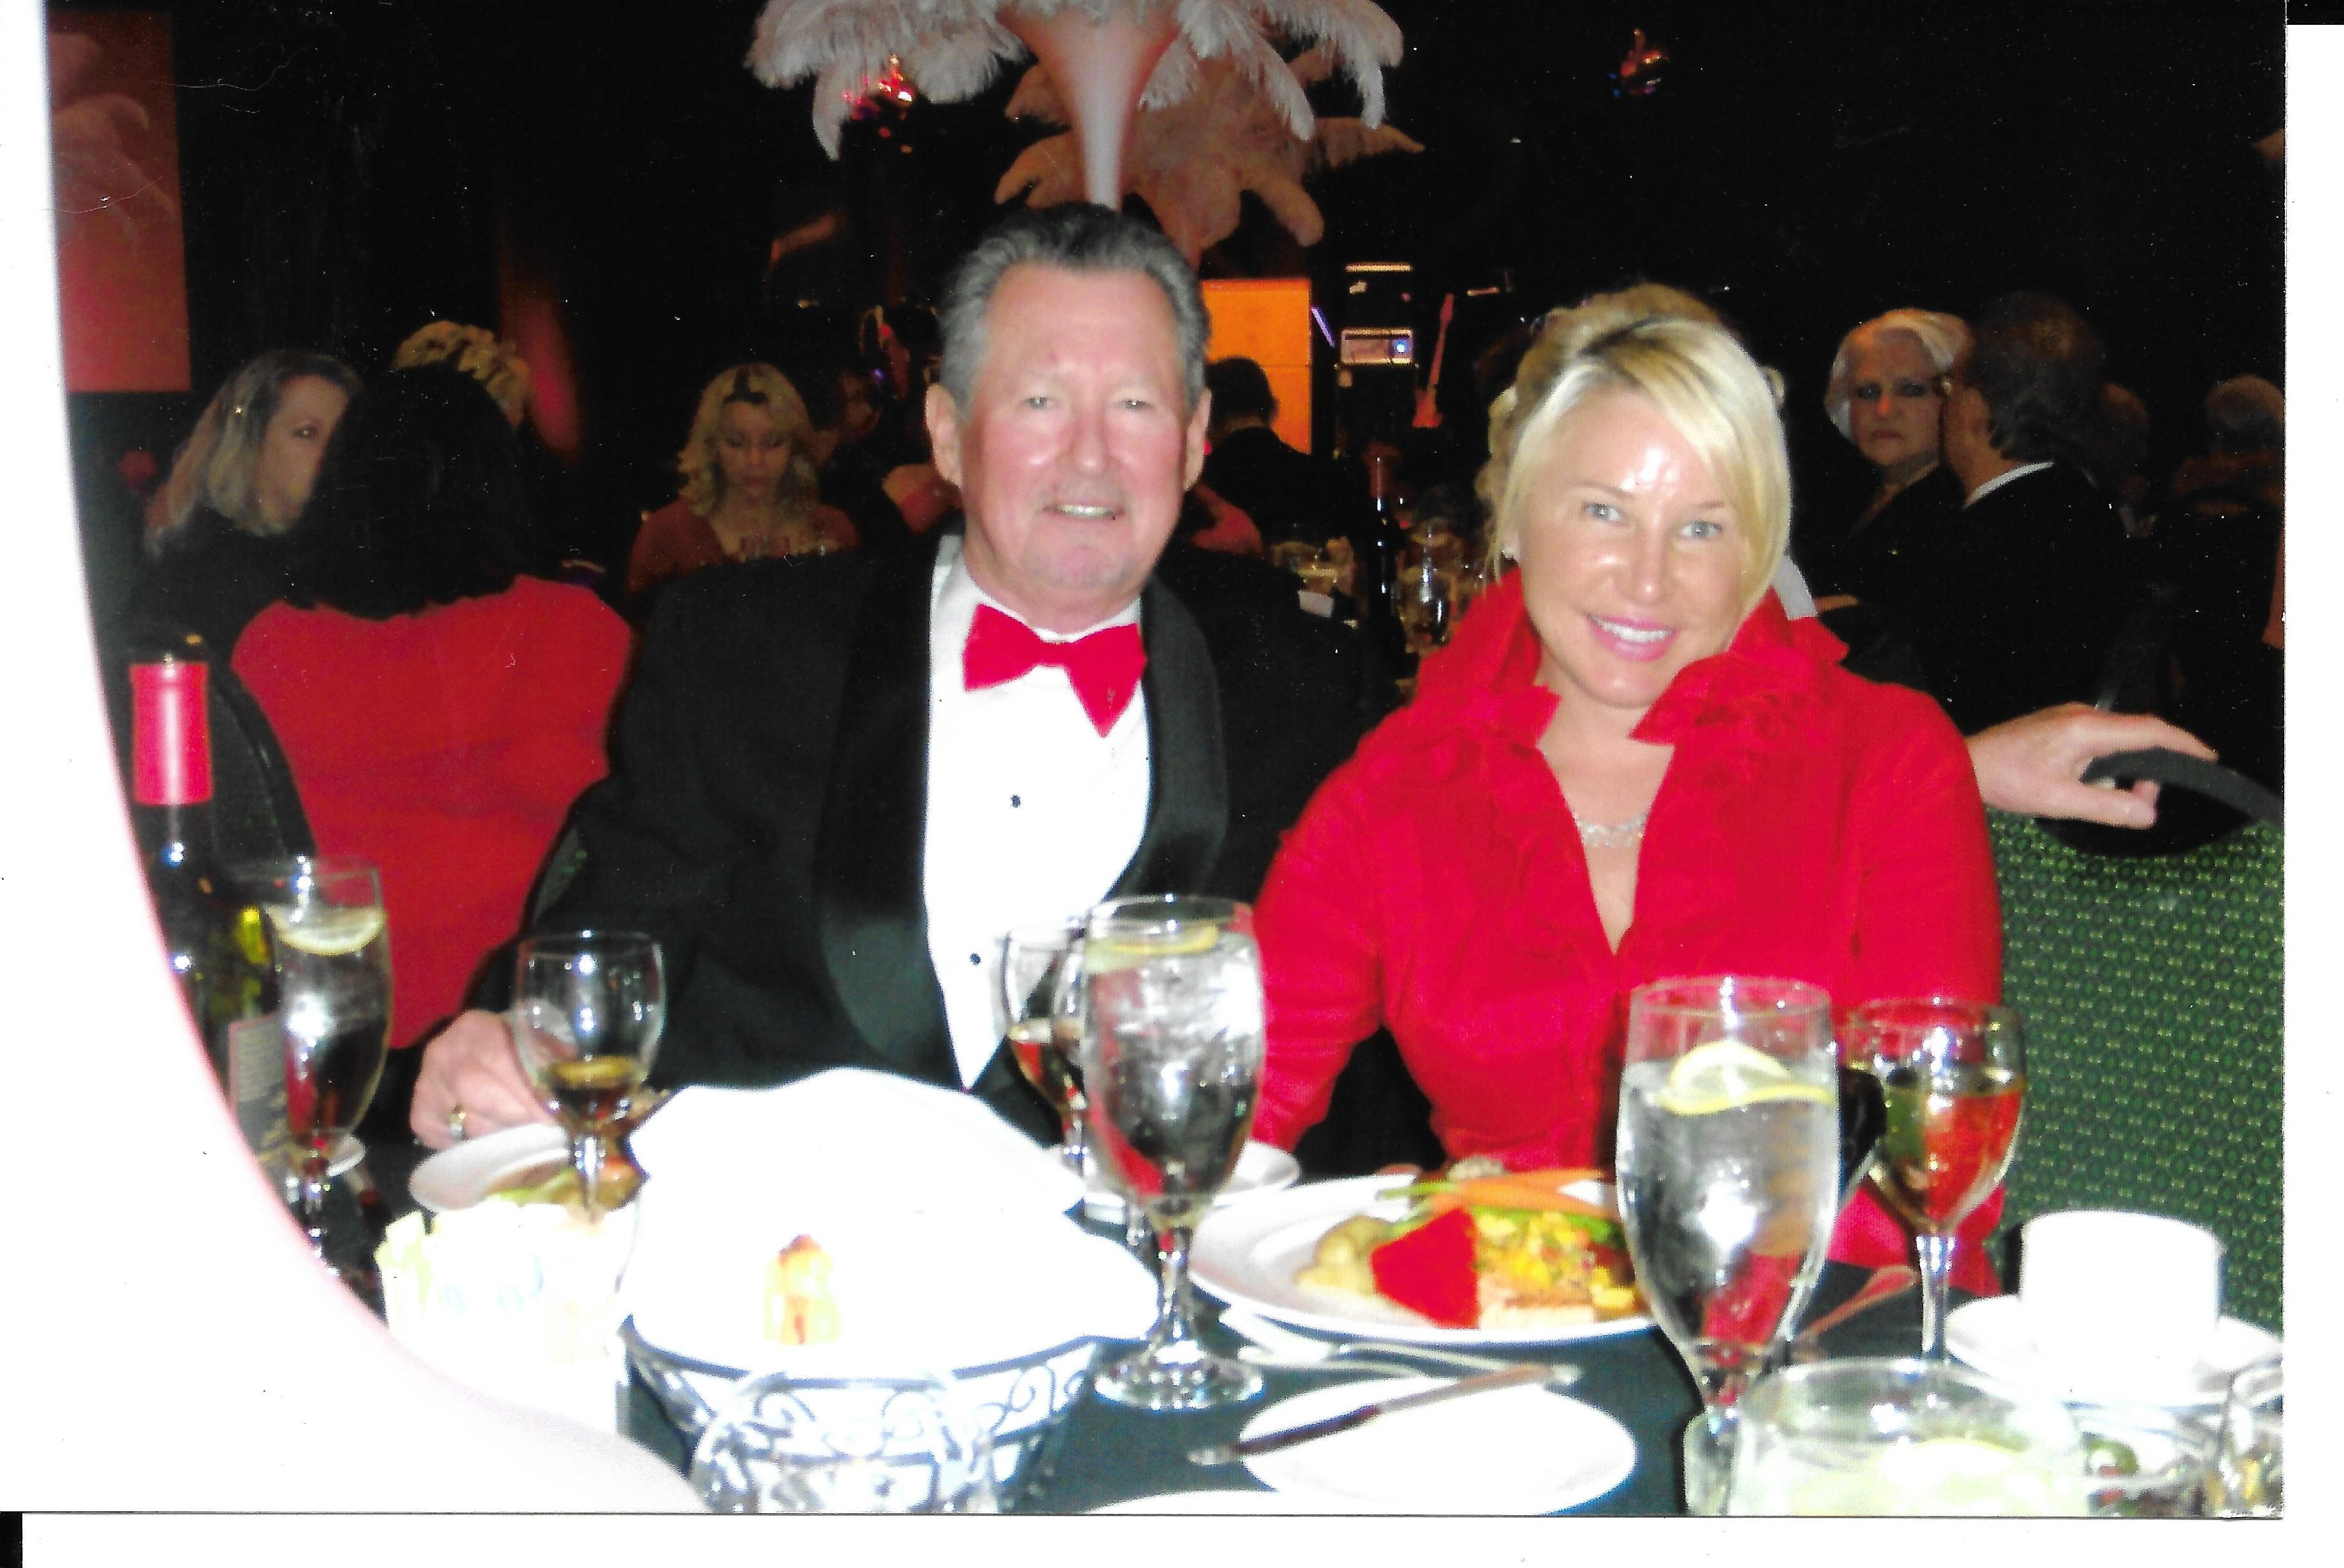 2018 Gala honoring Jack and Patti Grundhofer